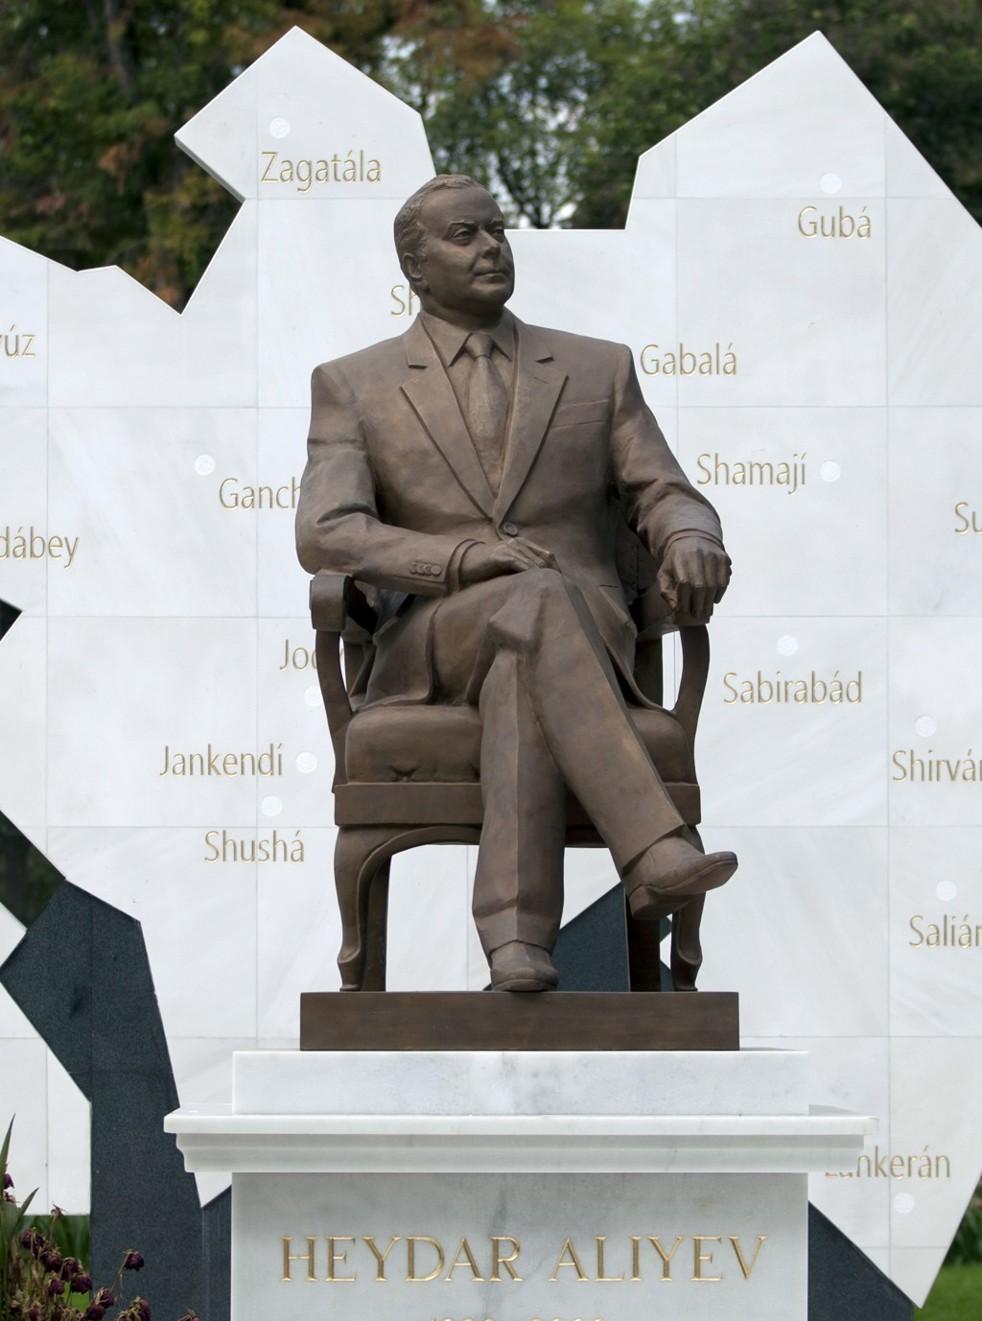 Mexico City Removes Aliyev Statue